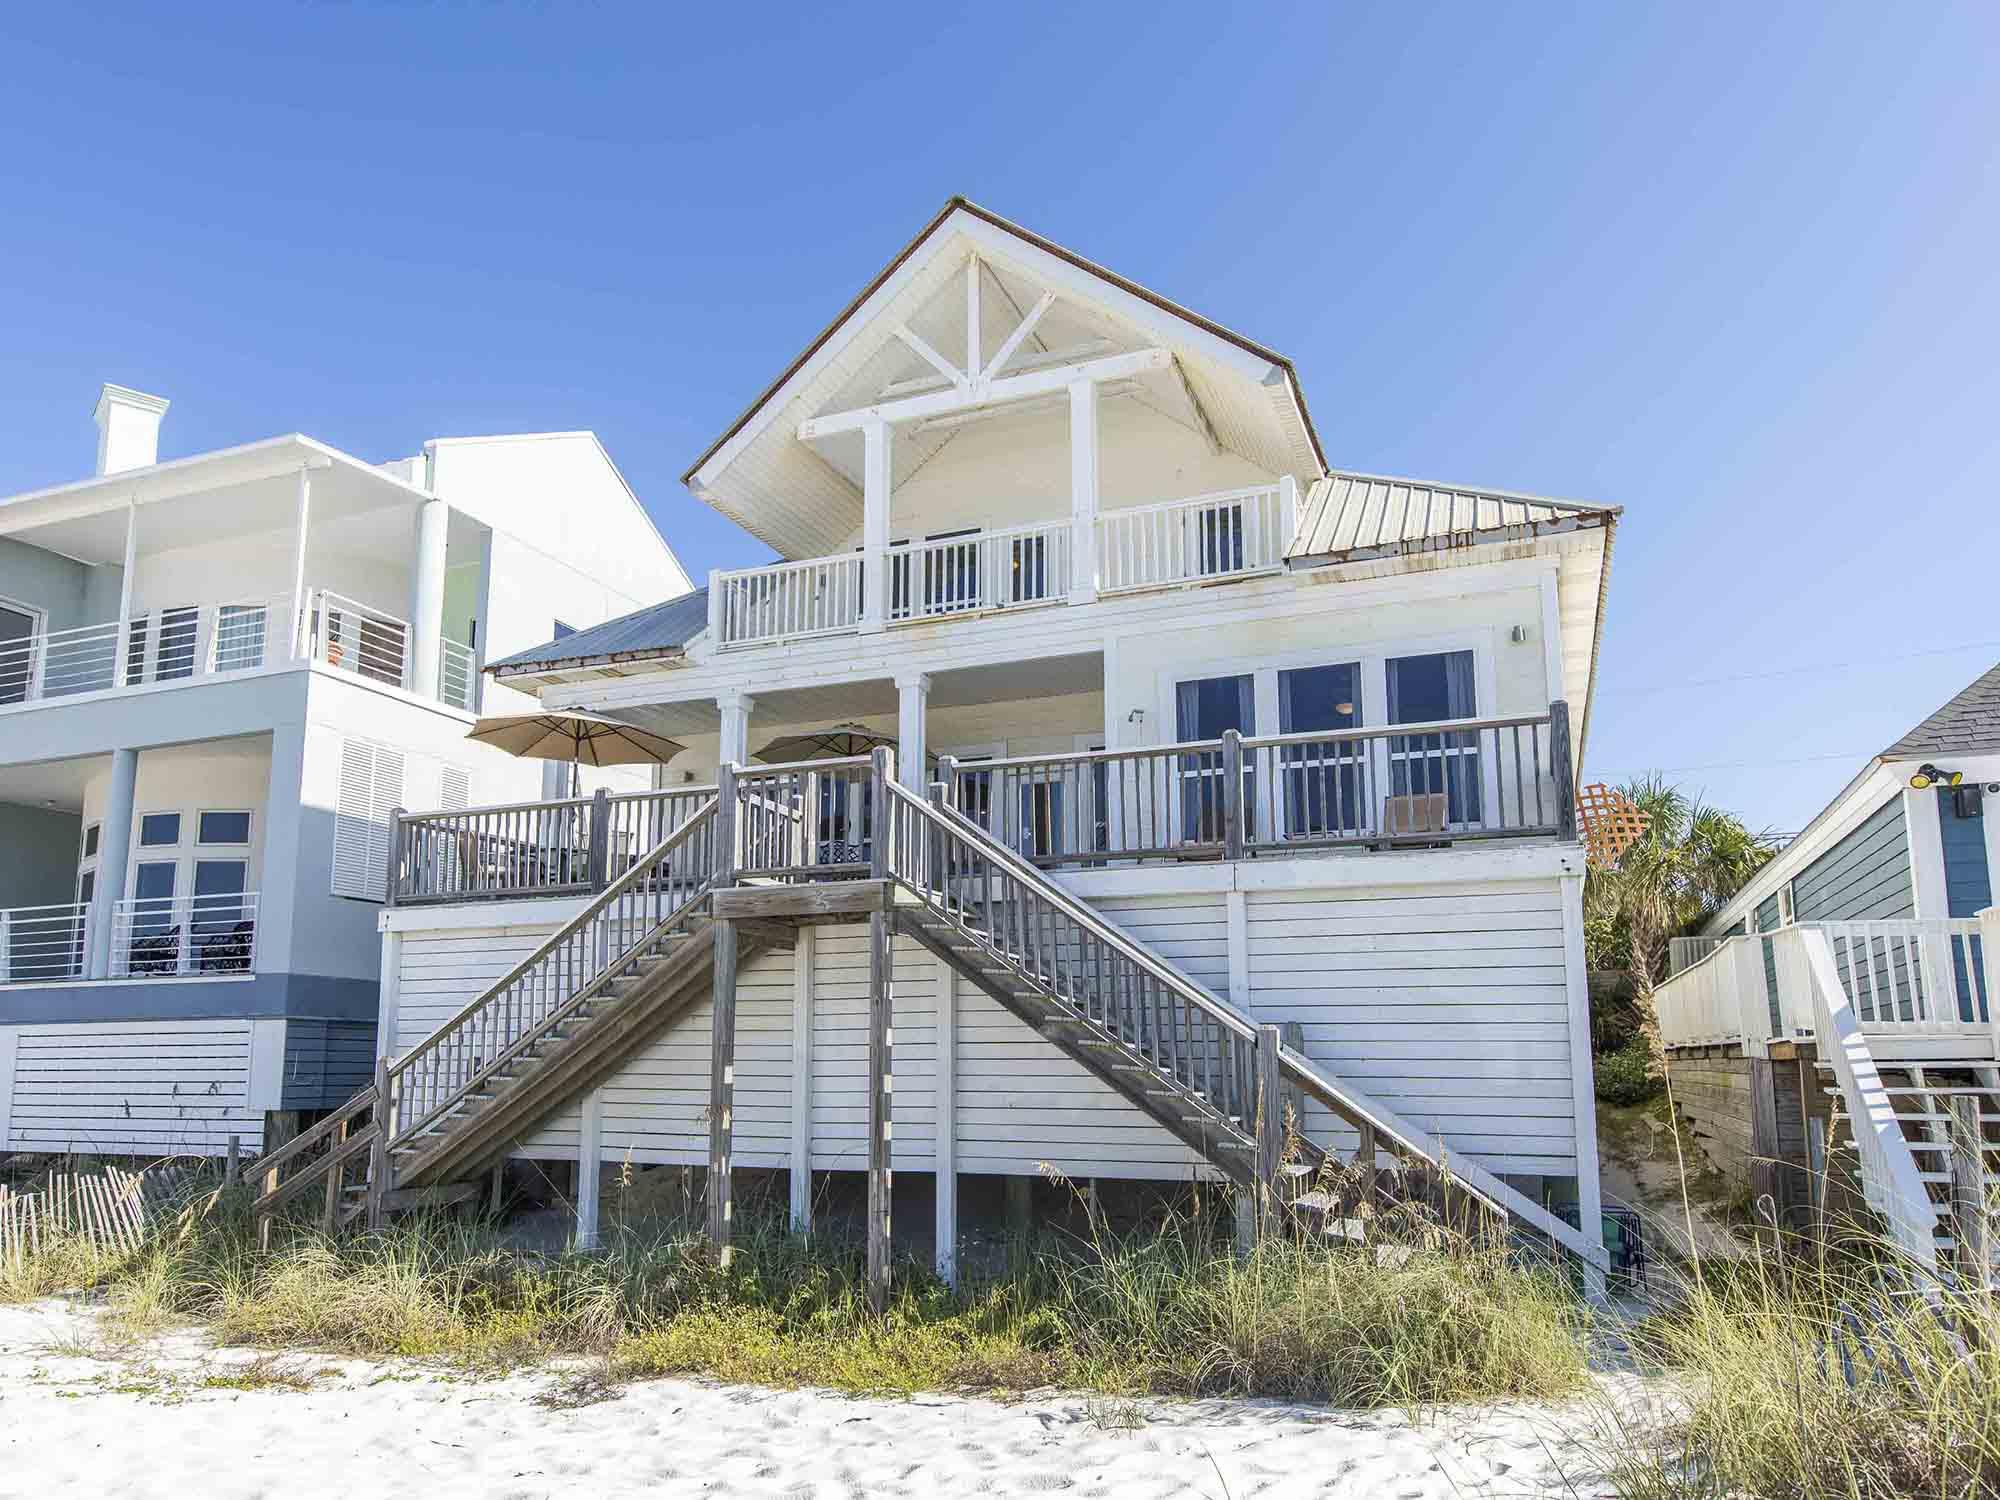 Spring break vacation home rentals in Panama City Beach